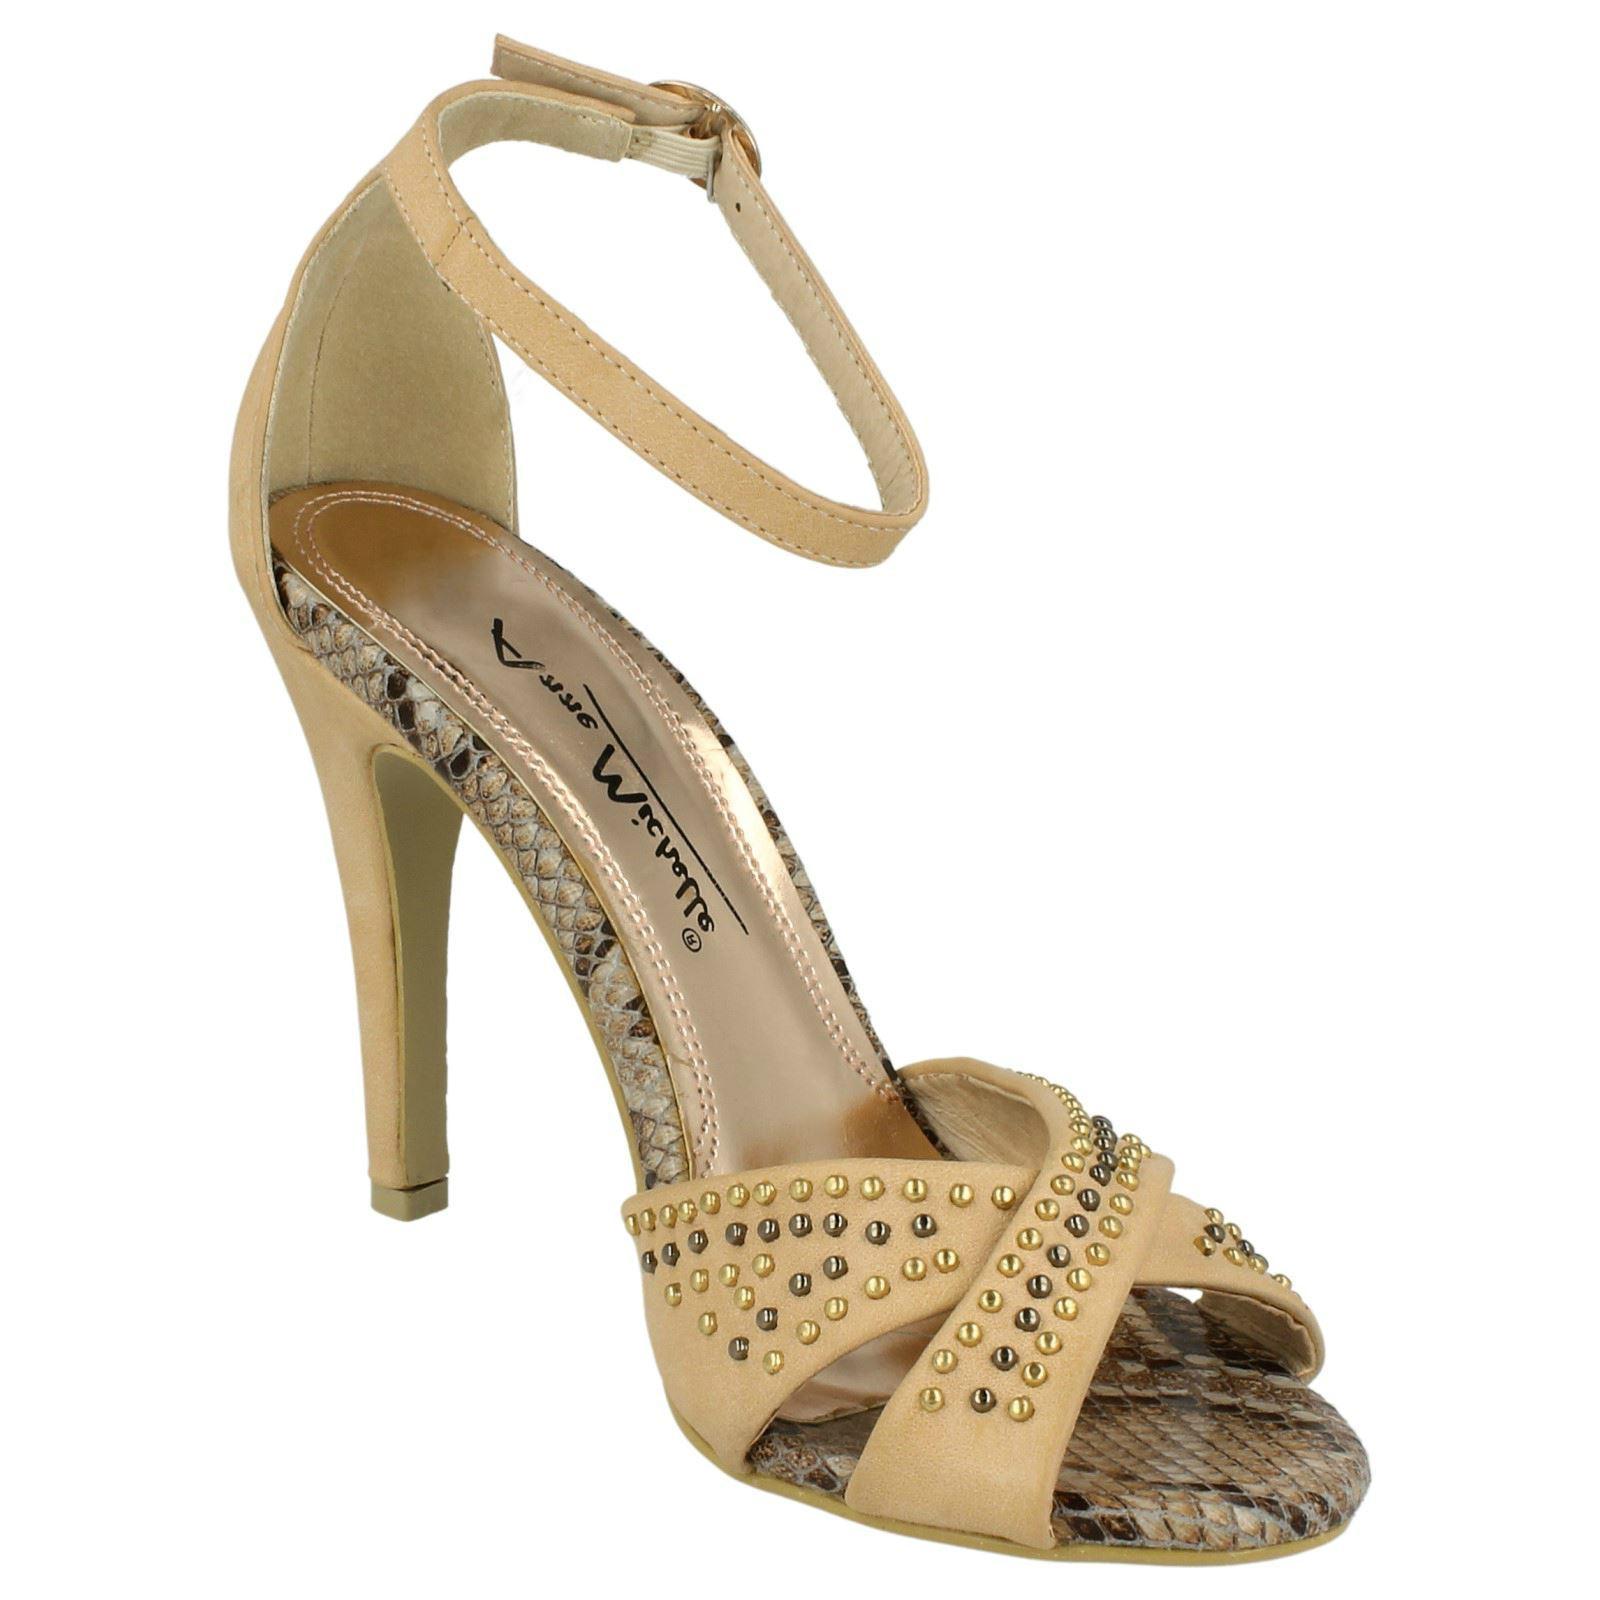 Ladies Ankle Strap Studded Detail Sandals Anne Michelle Black Camel Coral L3391